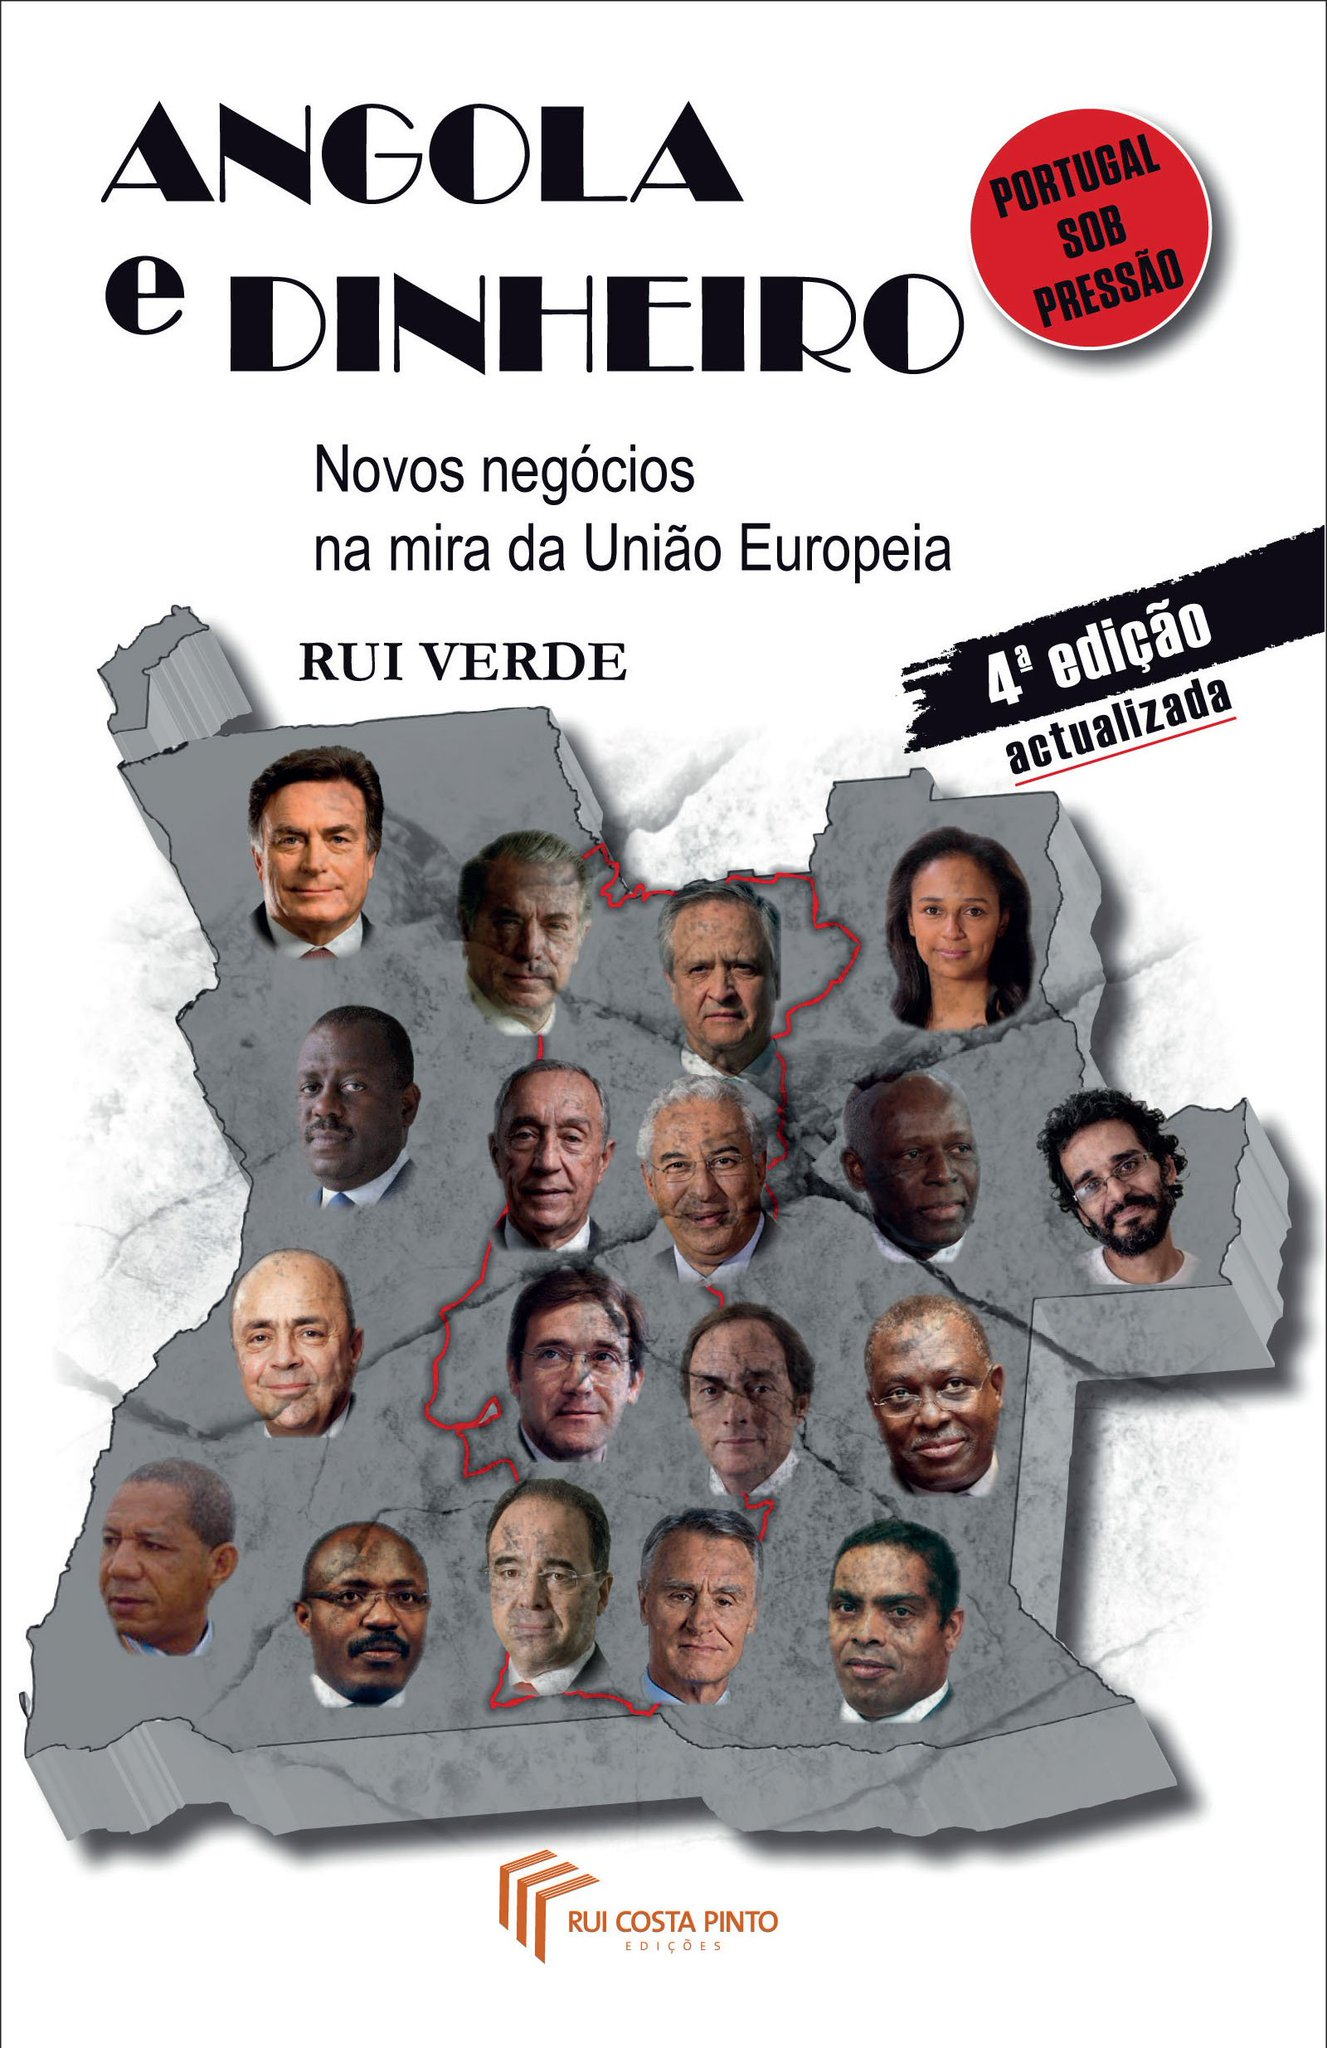 Numa Livraria perto de si @liv_almedina BULHOSA @Fnac @PortoEditora, BERTRAND Ler + https://t.co/ZVLYoMOL86 https://t.co/4Nt8UP8FXS